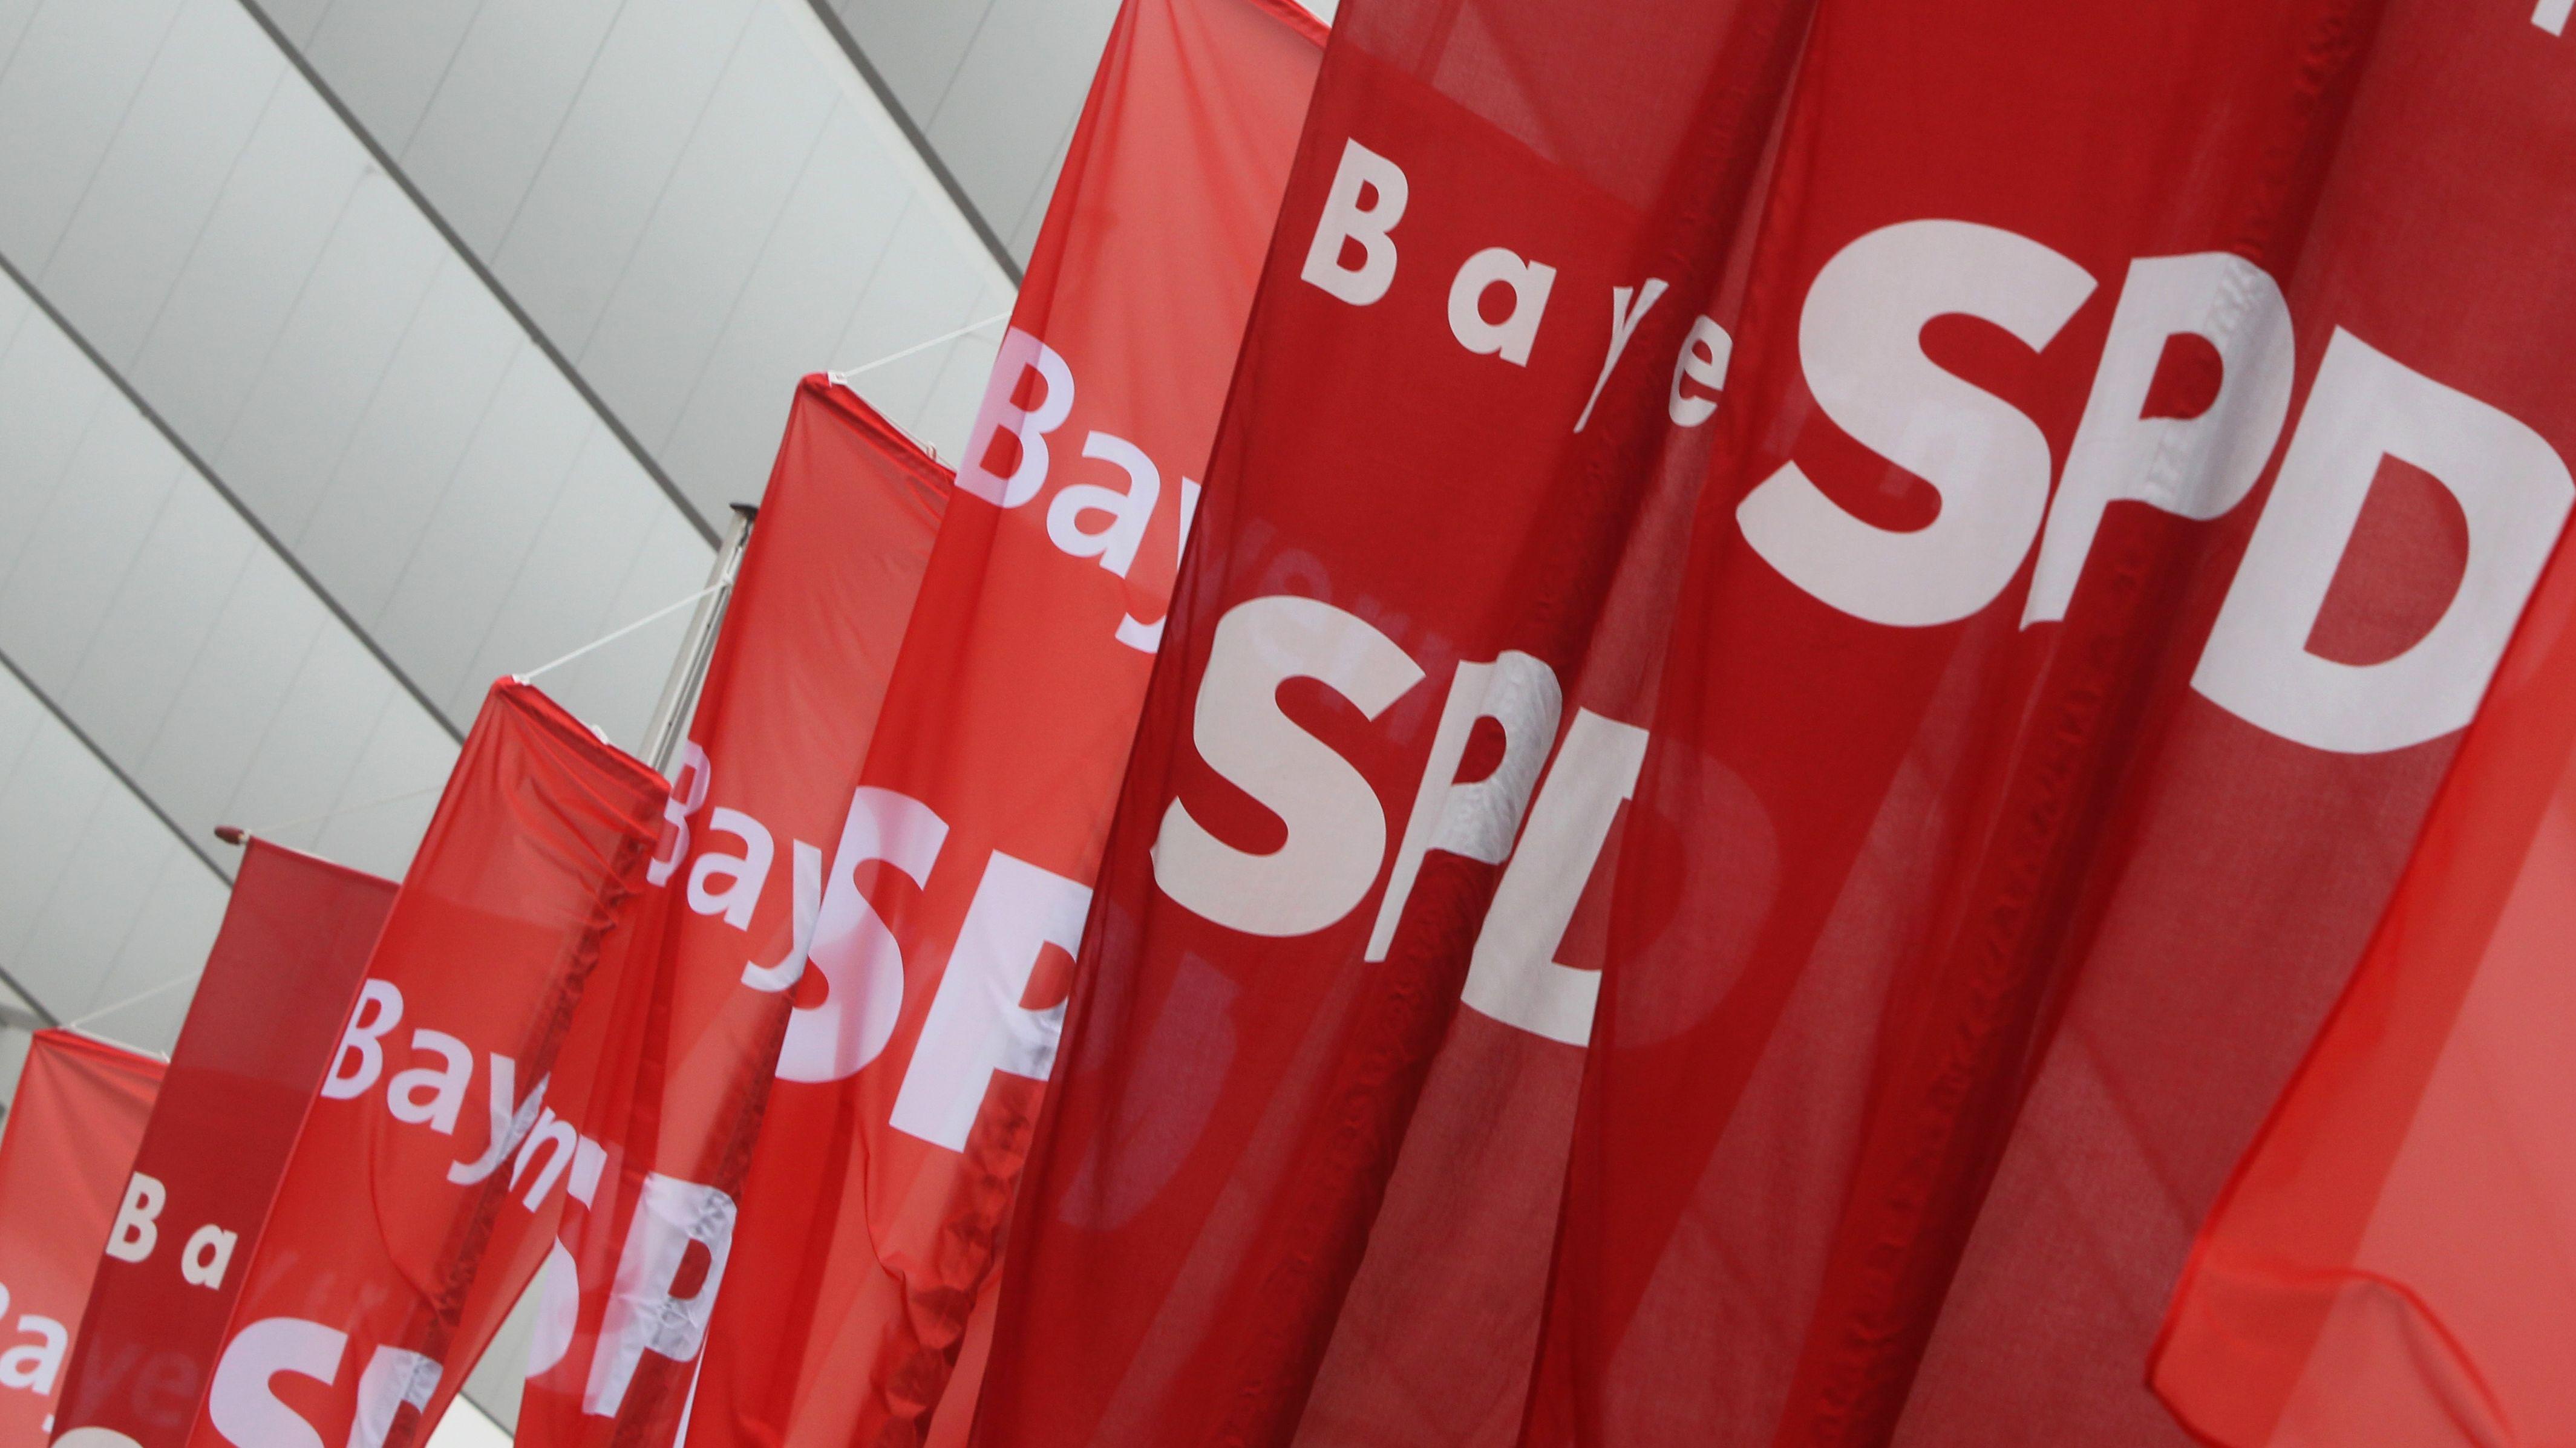 Bayern-SPD-Flaggen